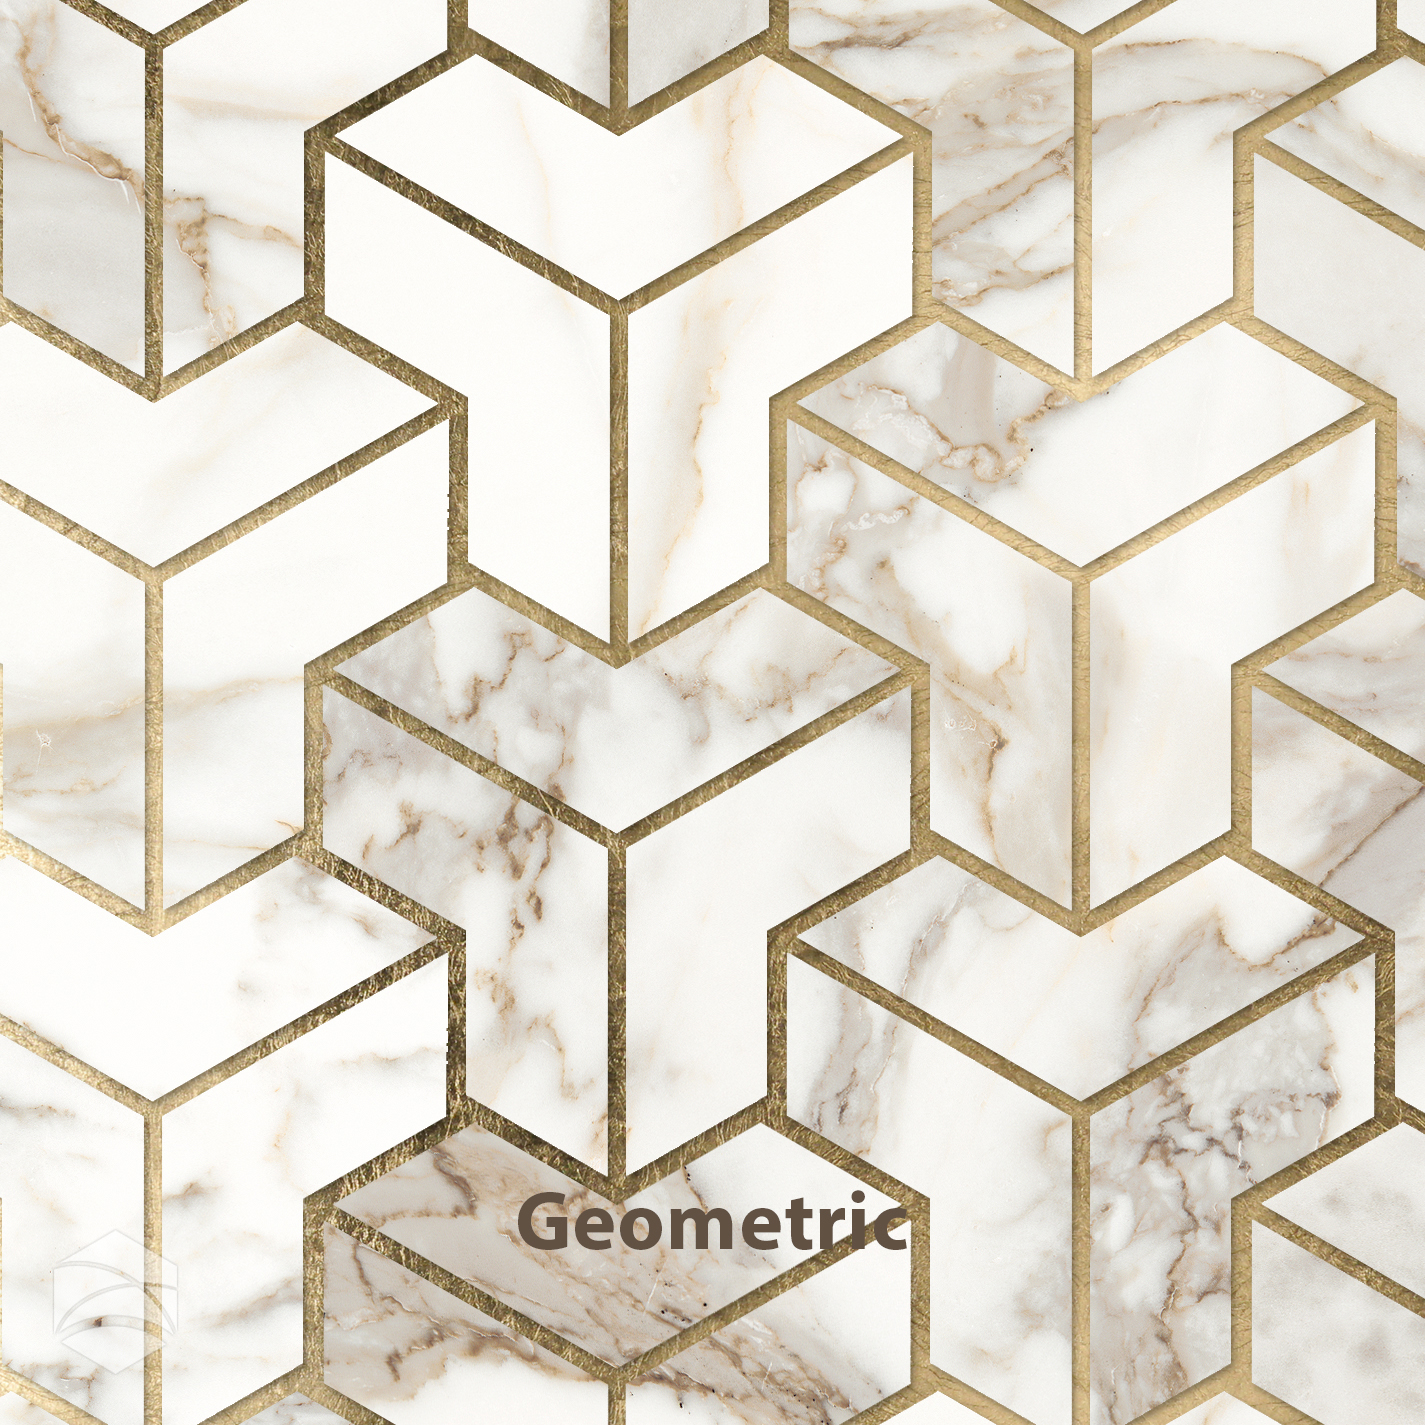 Geometric_V2_14x14.jpg